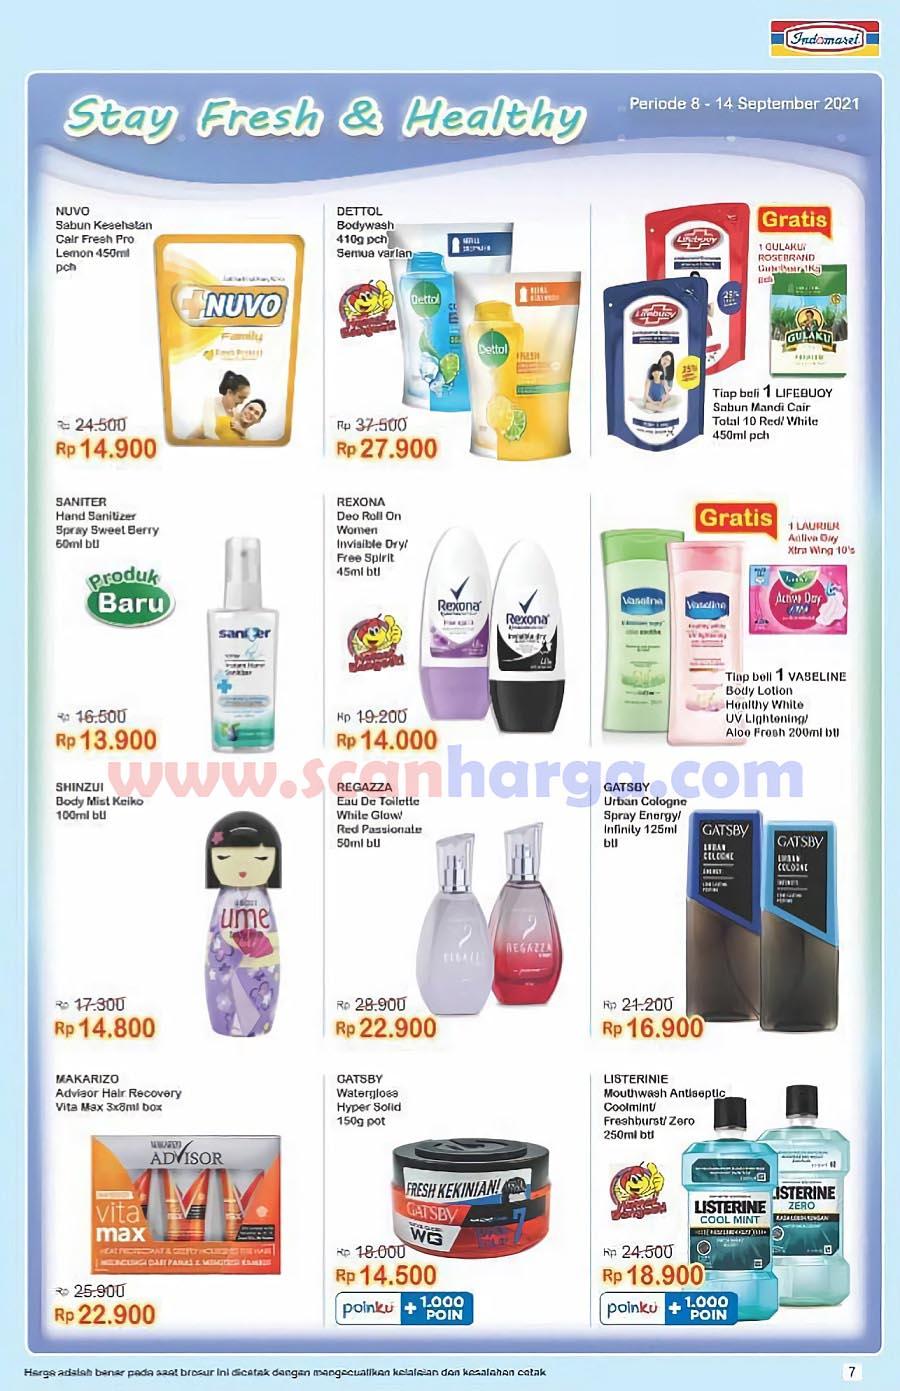 Katalog Indomaret Promo Terbaru 8 - 14 September 2021 7